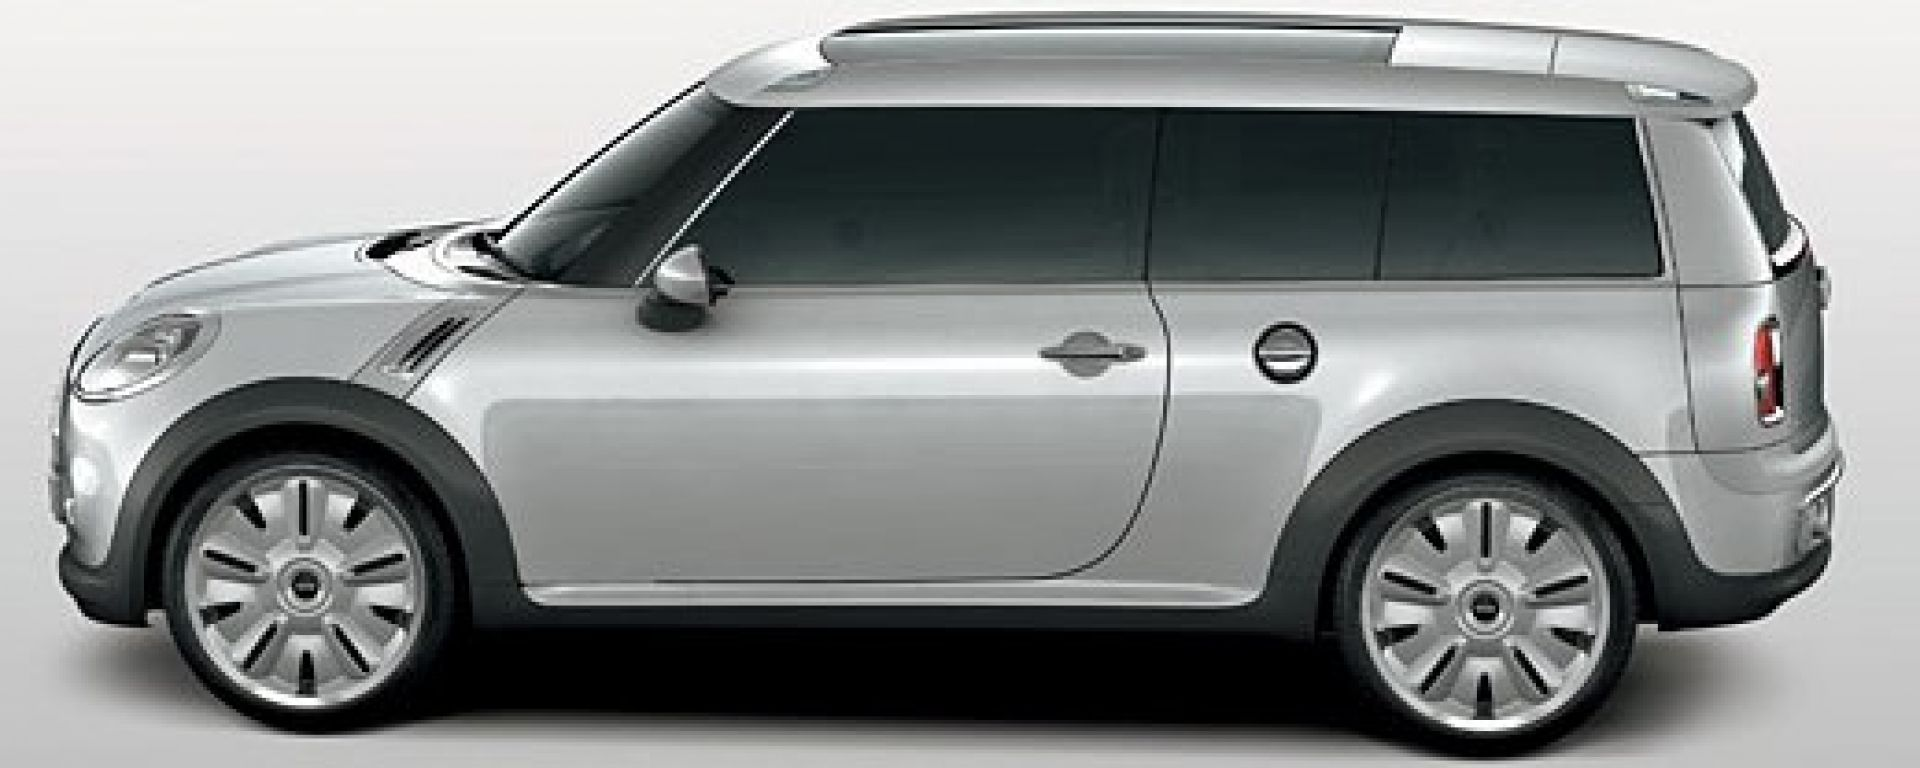 Mini Concept Frankfurt: sarà la nuova Traveller?